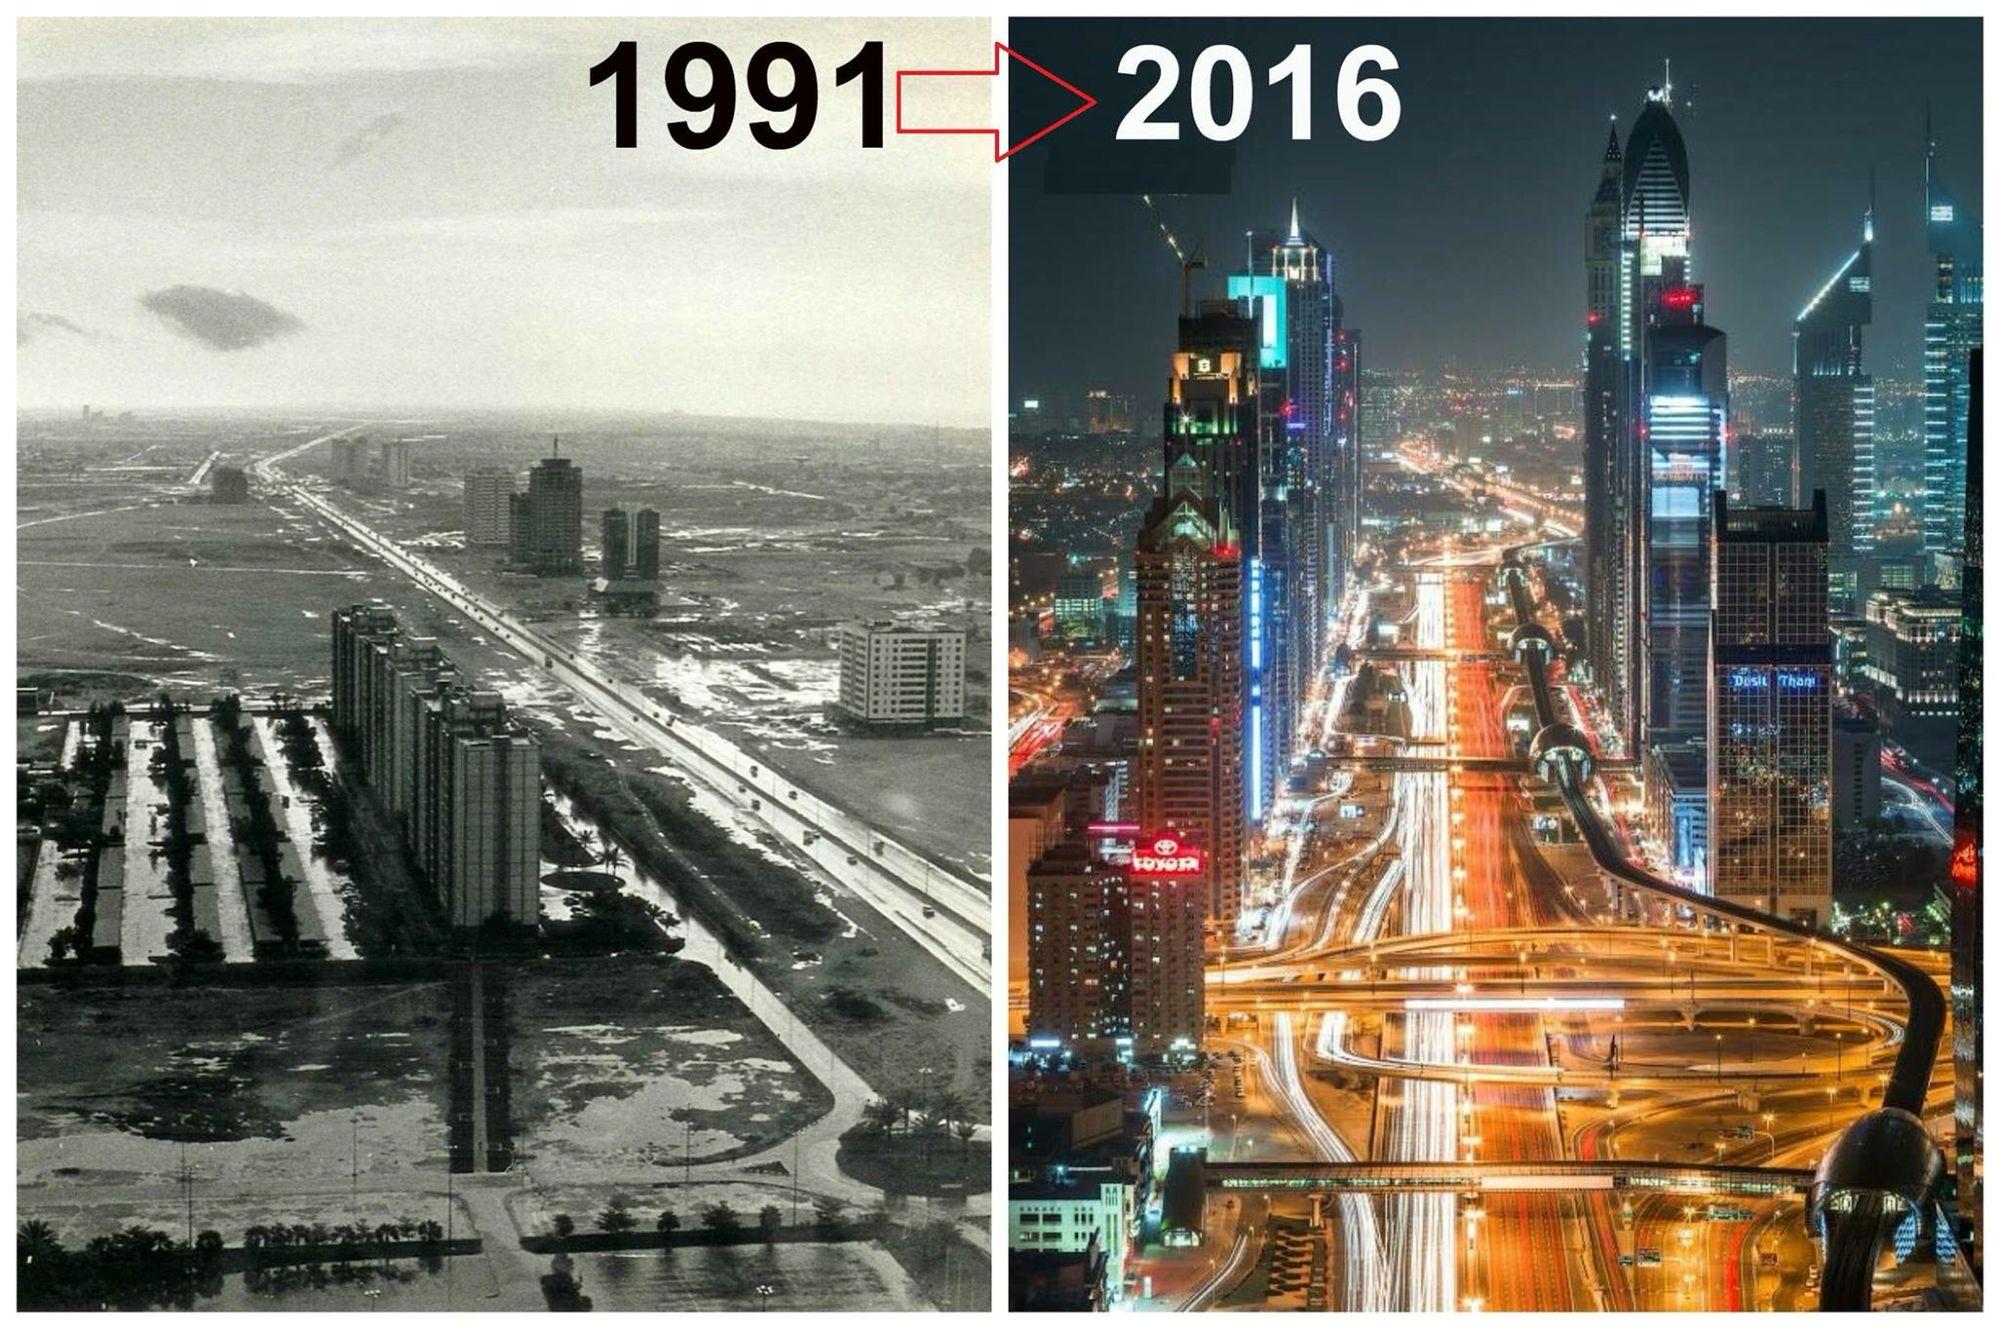 Dubai, before and after pics. | Dubai in 2019 | Dubai, Tourism, Architecture